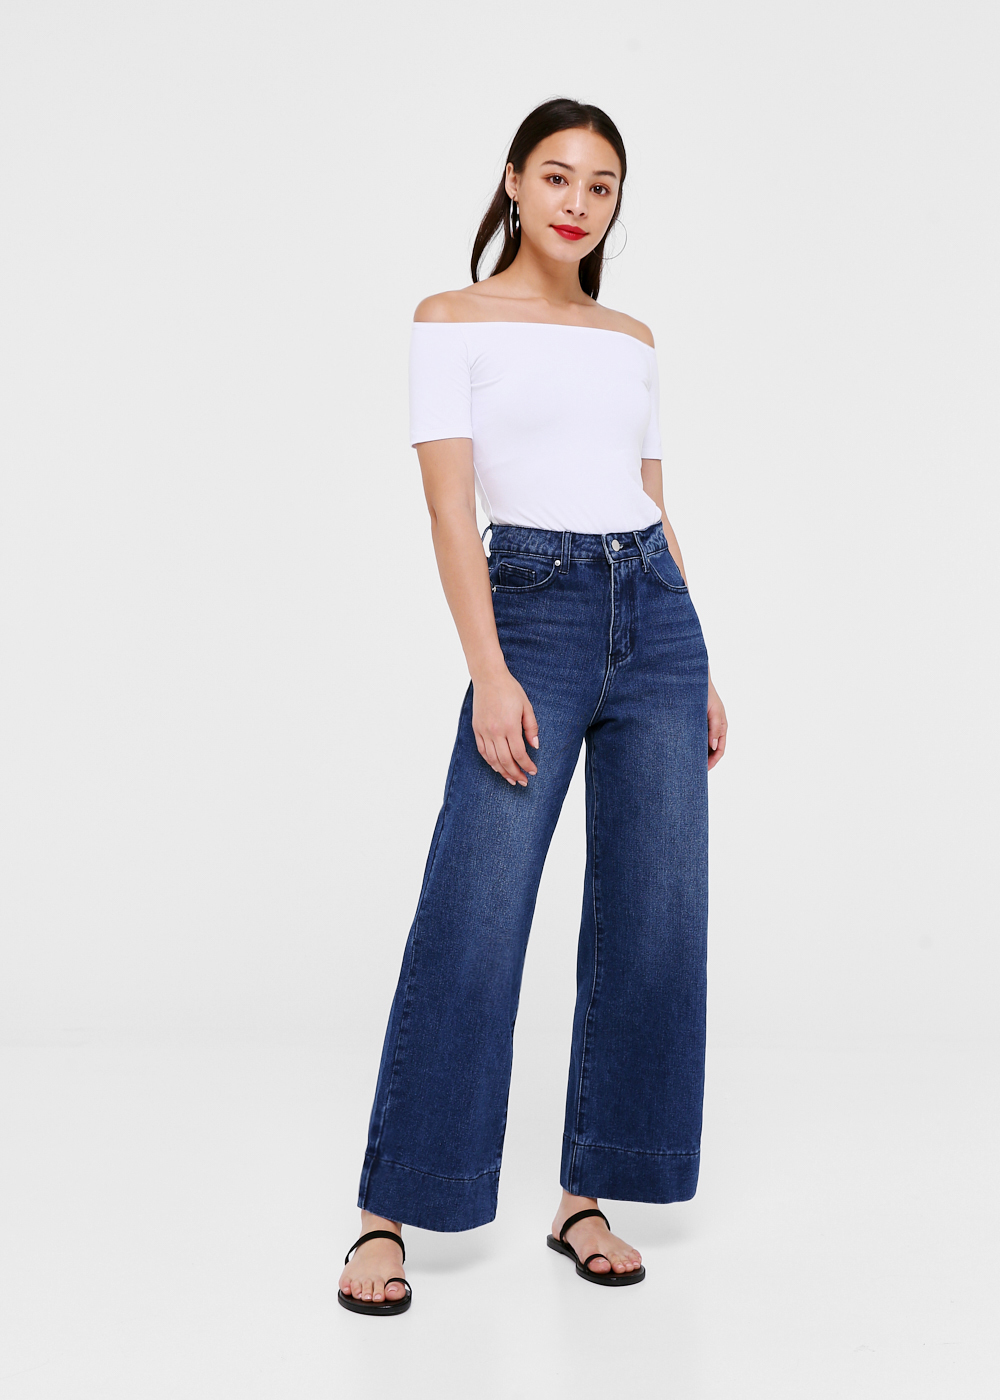 Leighton High-rise Wide Leg Jeans - Medium Wash